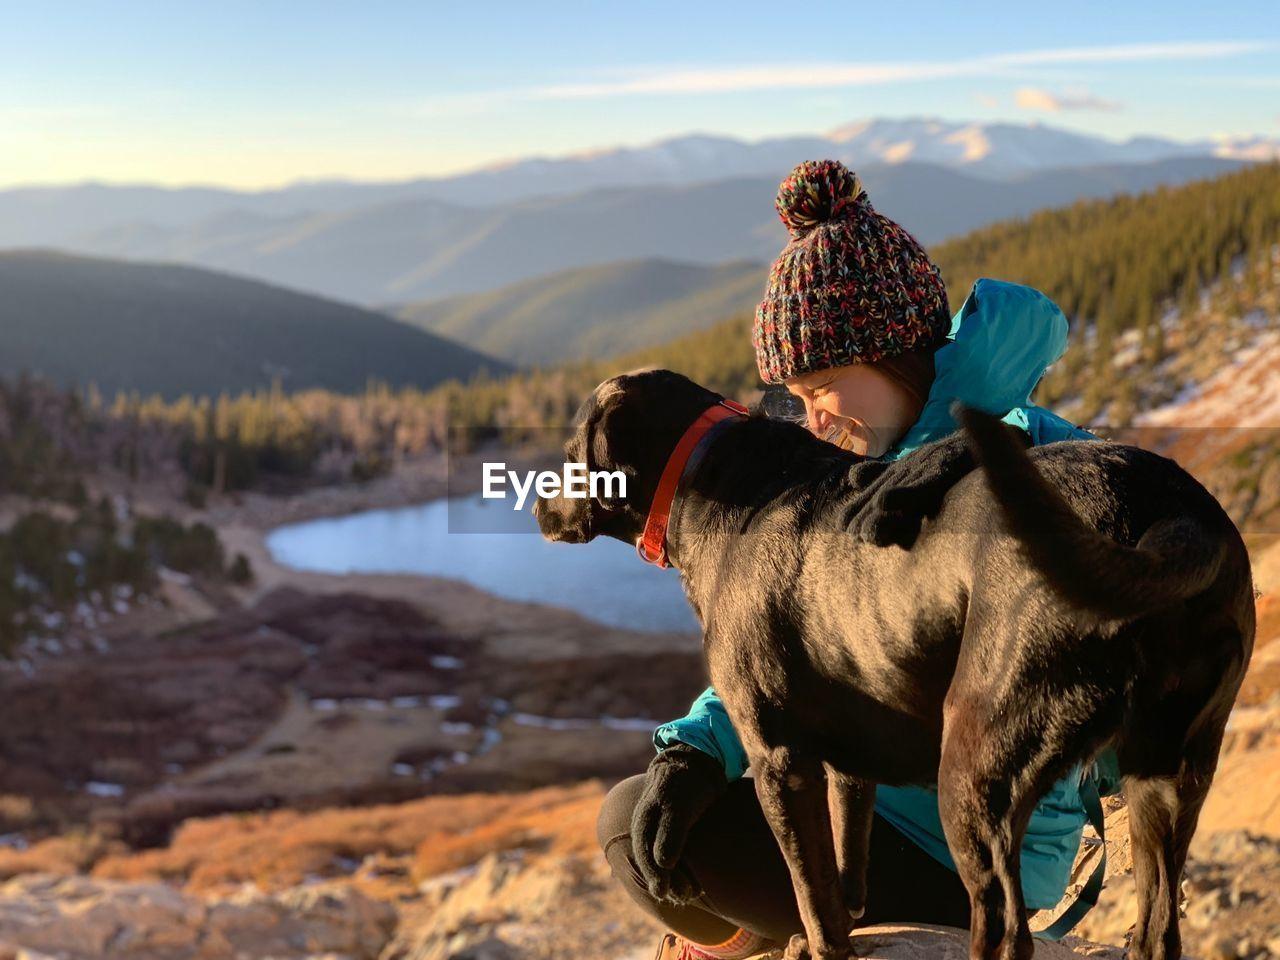 Smiling Woman Petting Dog